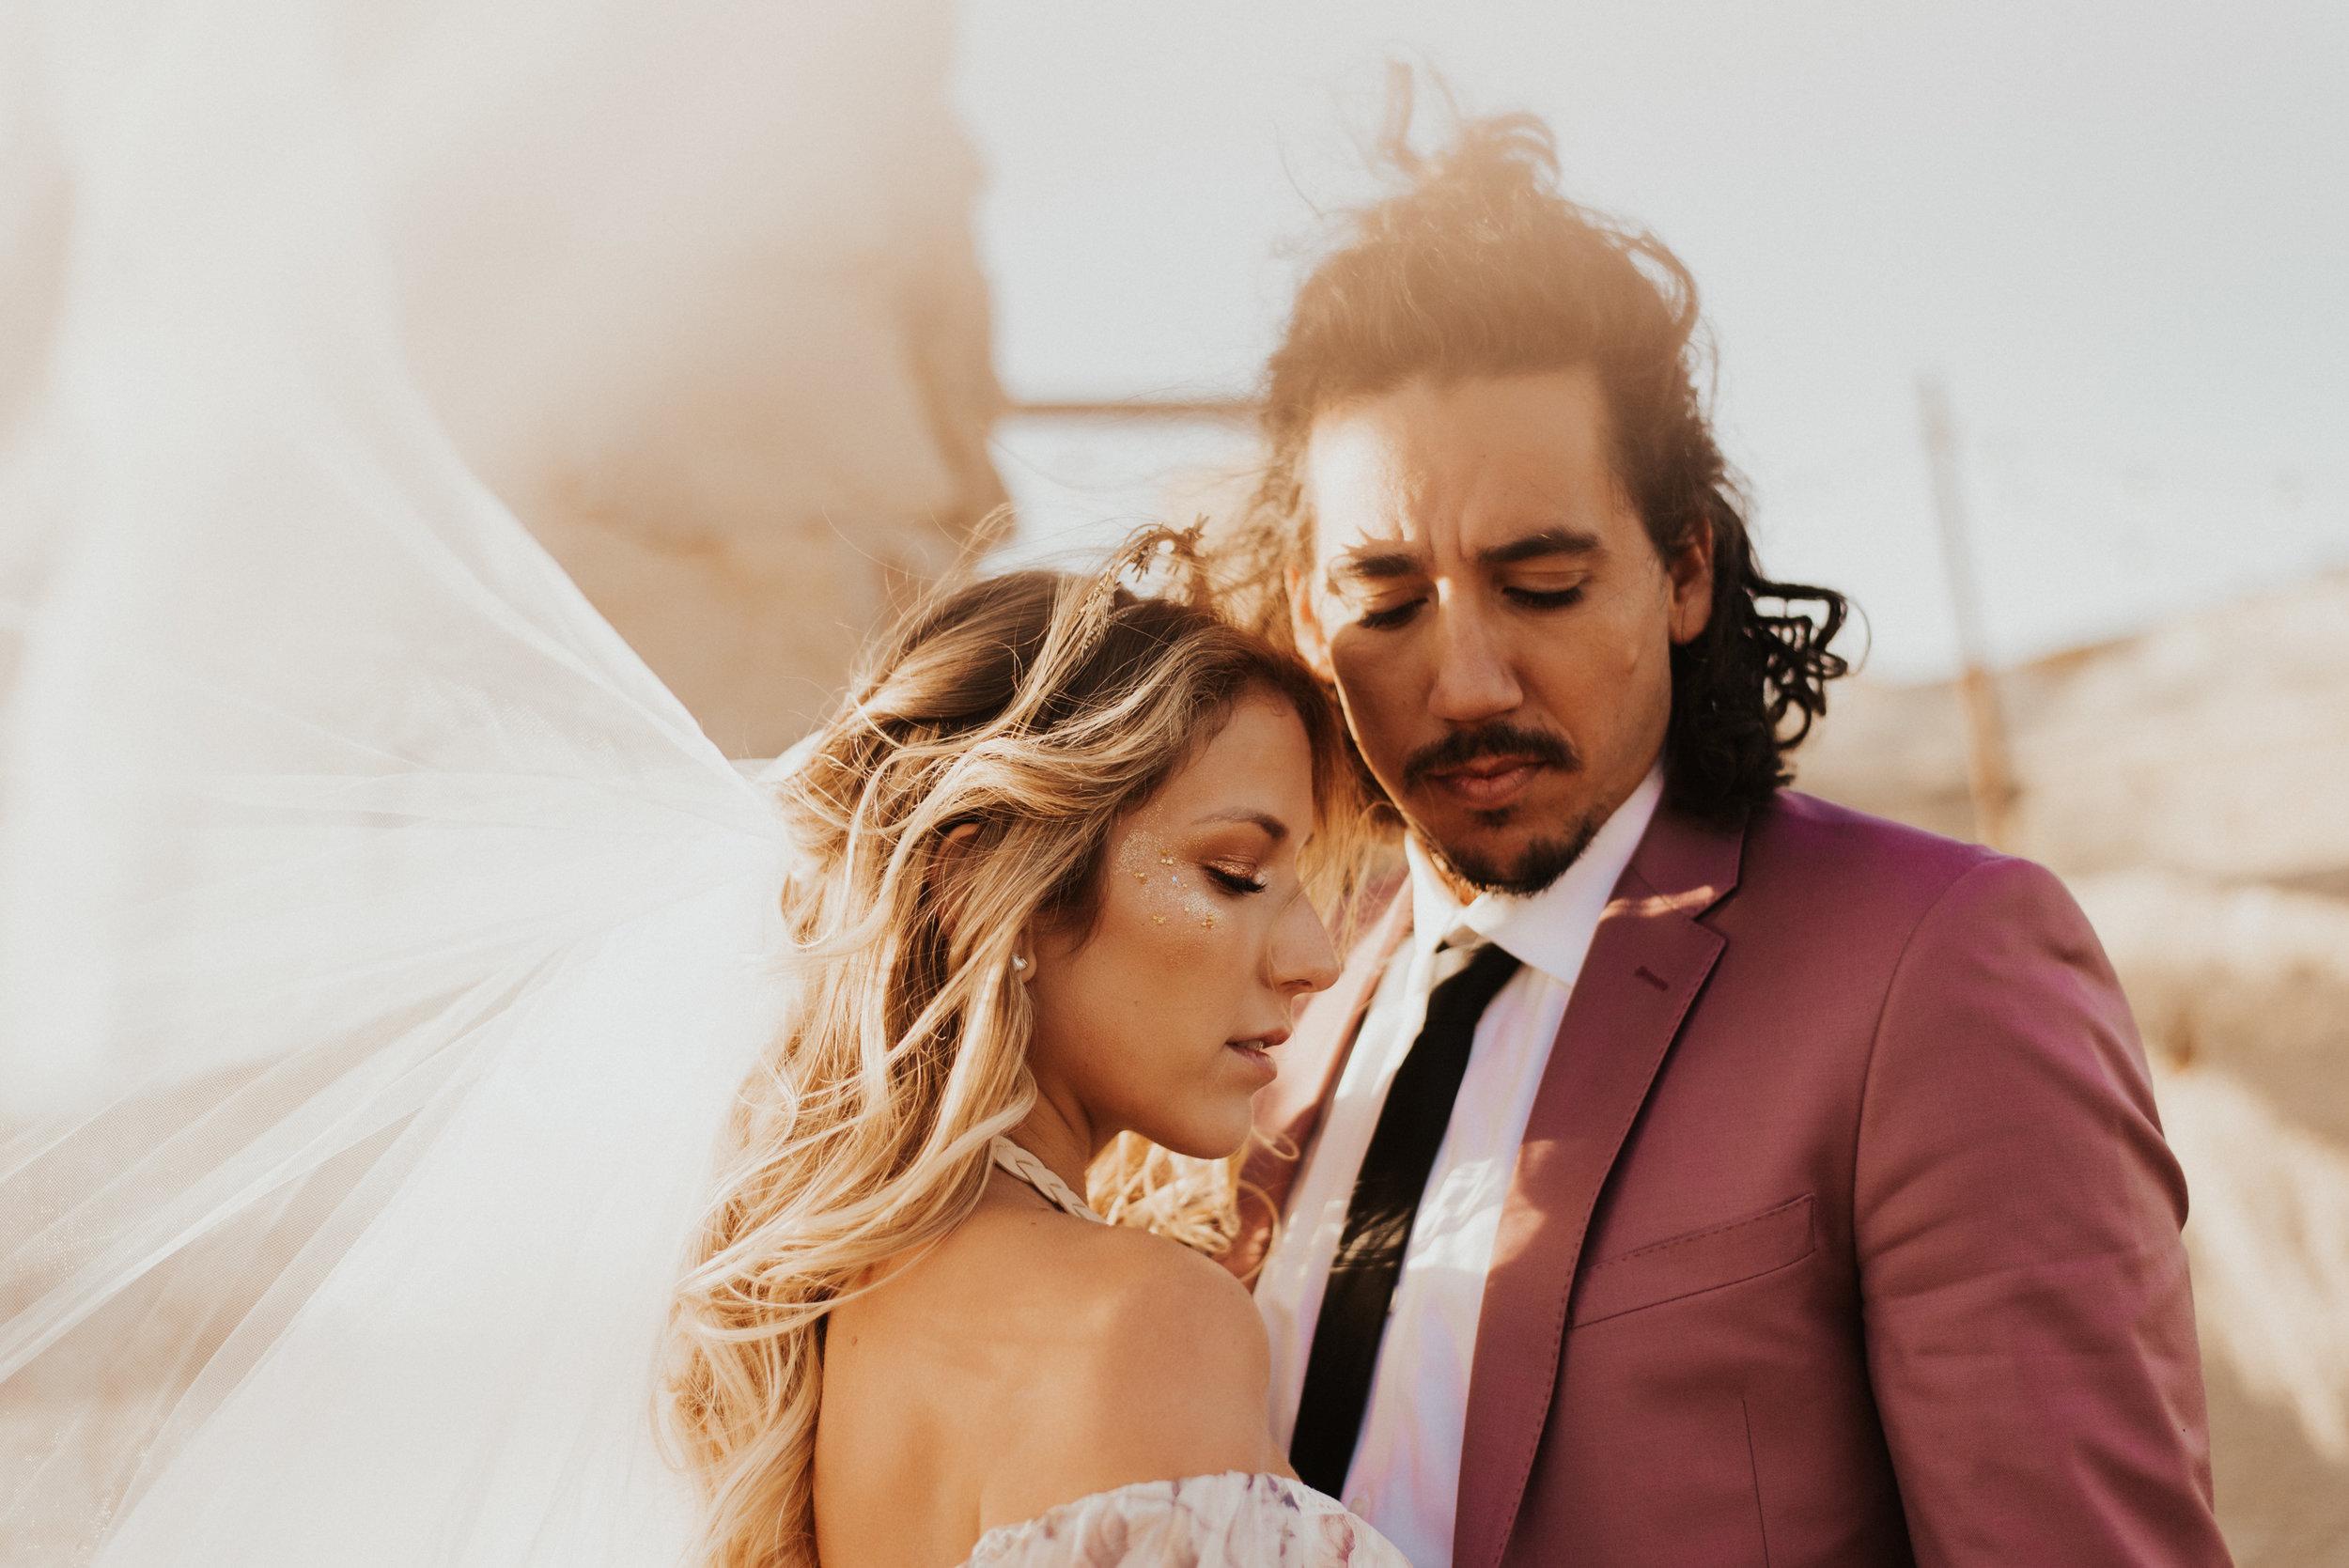 FortSt.John_photographer_TyraEPhotography_Wedding_Couple_Family_Photograhy_DawsonCreek_Elopement_Bride_Boduoir_Portraits-7876.jpg